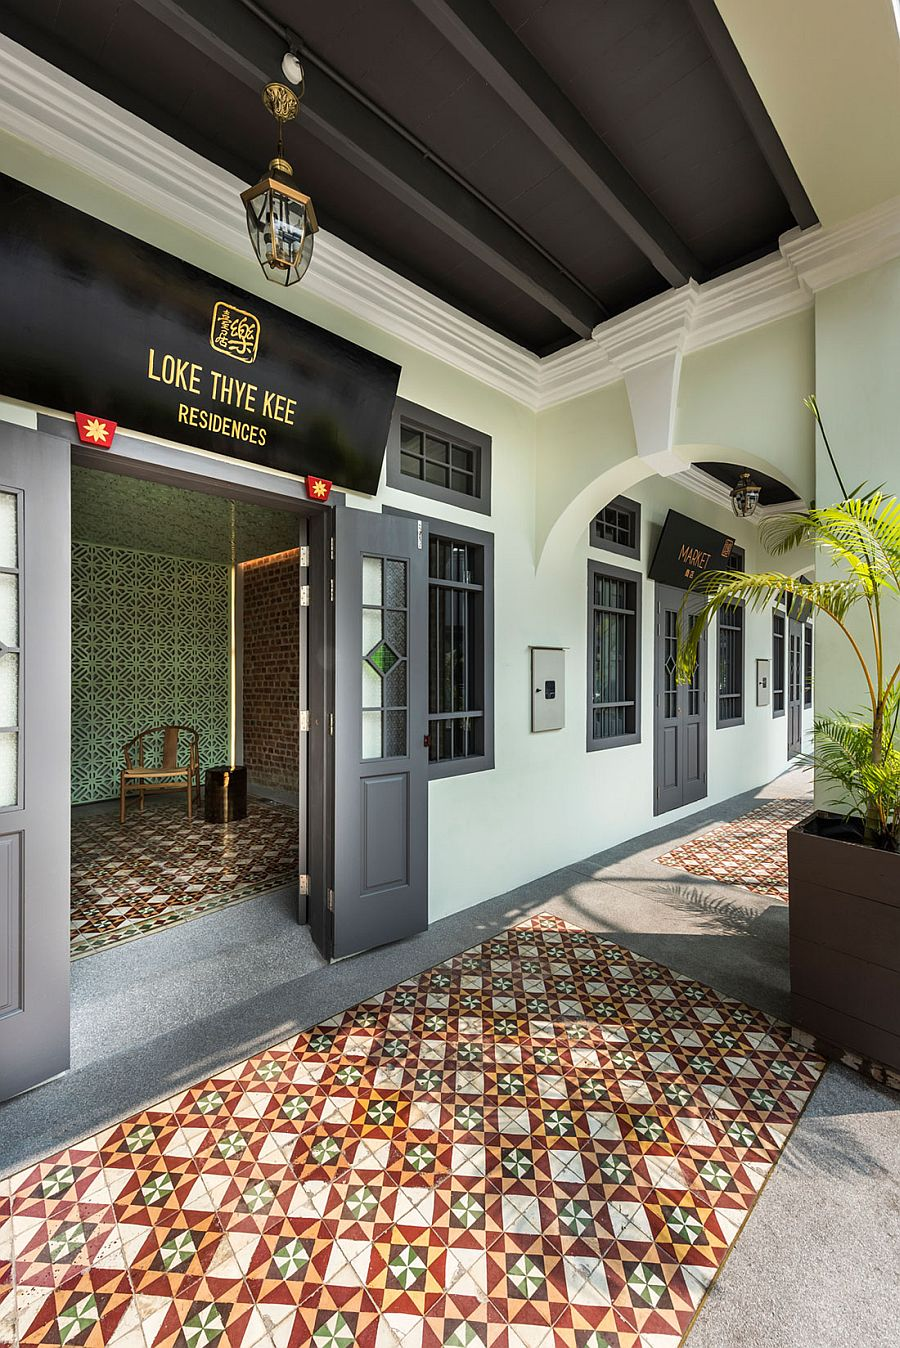 Loke Thye Kee Residences in Malaysia combines heritage with modern amenities